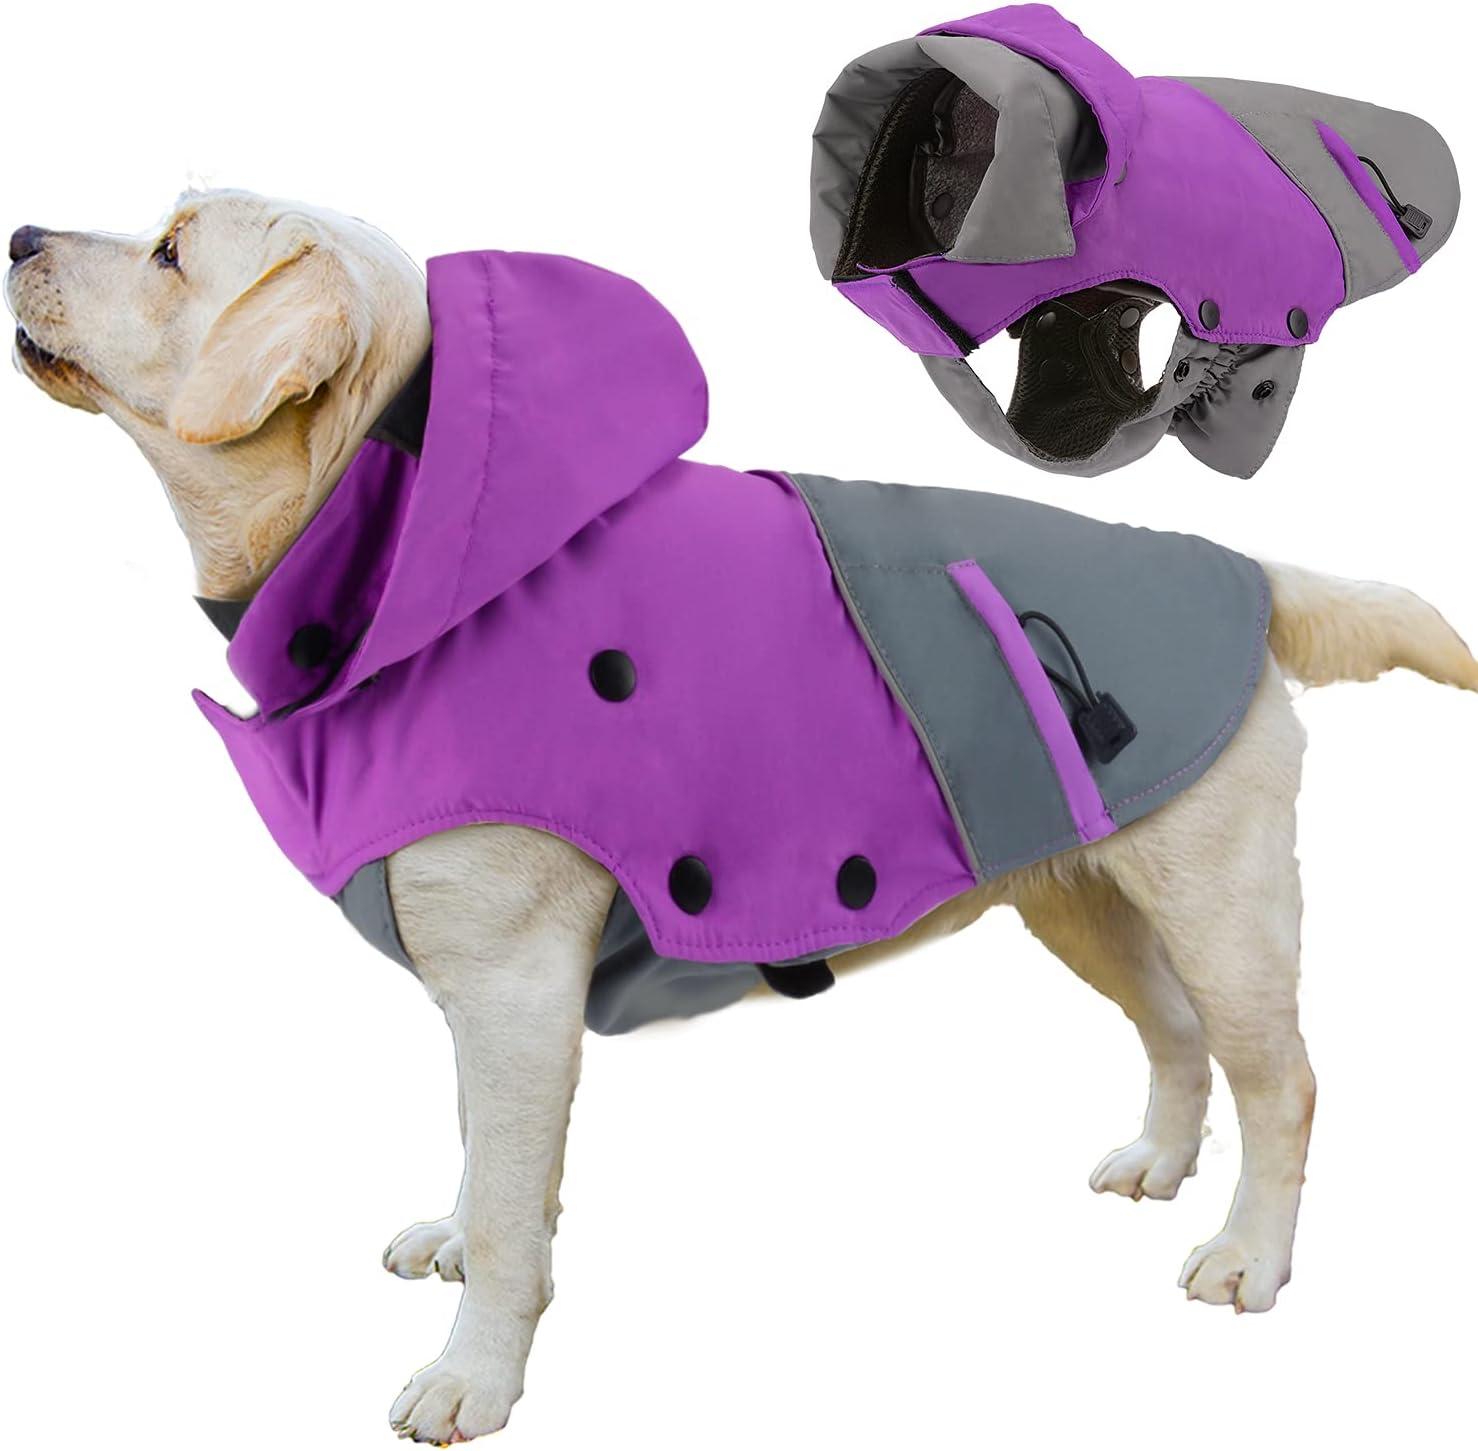 PETLOFT Dog Winter Jacket Reflective Waterproof Max 60% OFF Coat Max 79% OFF